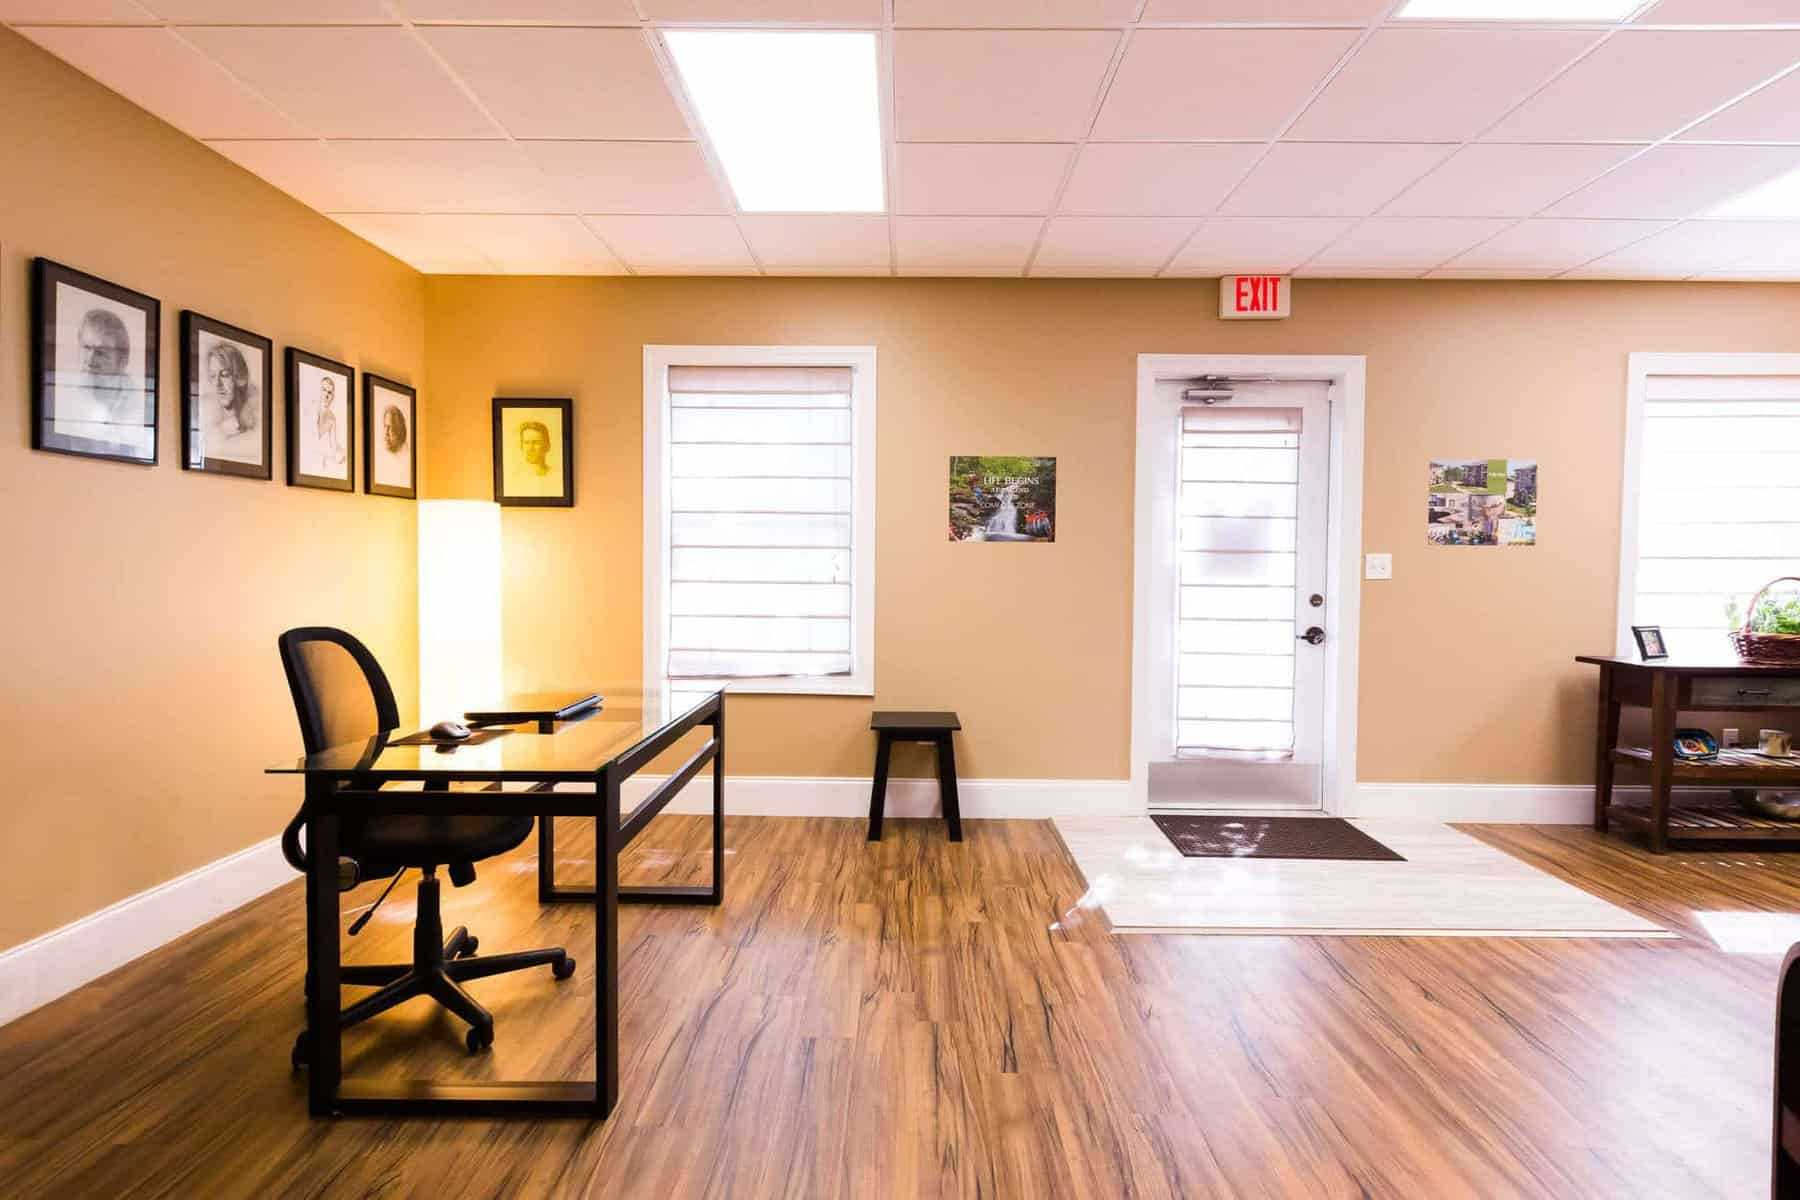 Gallery office floor Layout Next Step Asheville Office Next Step Recovery Next Step Recovery Office Gallery